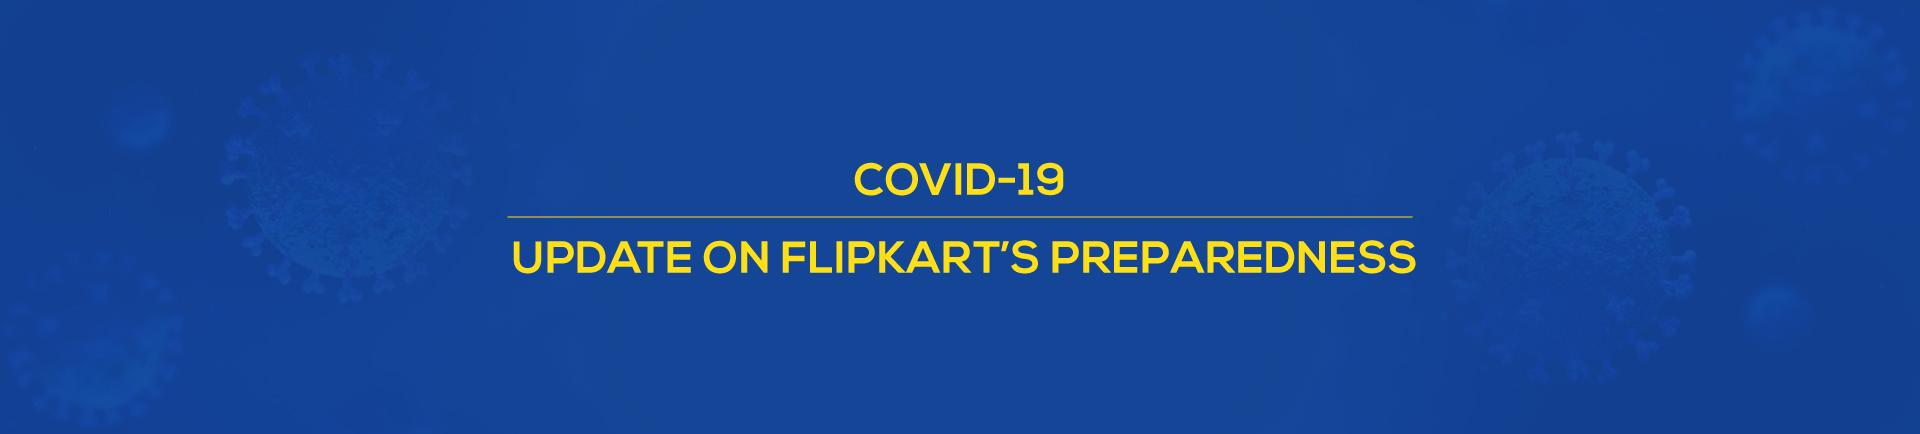 COVID-19 Coronavirus preparedness at Flipkart